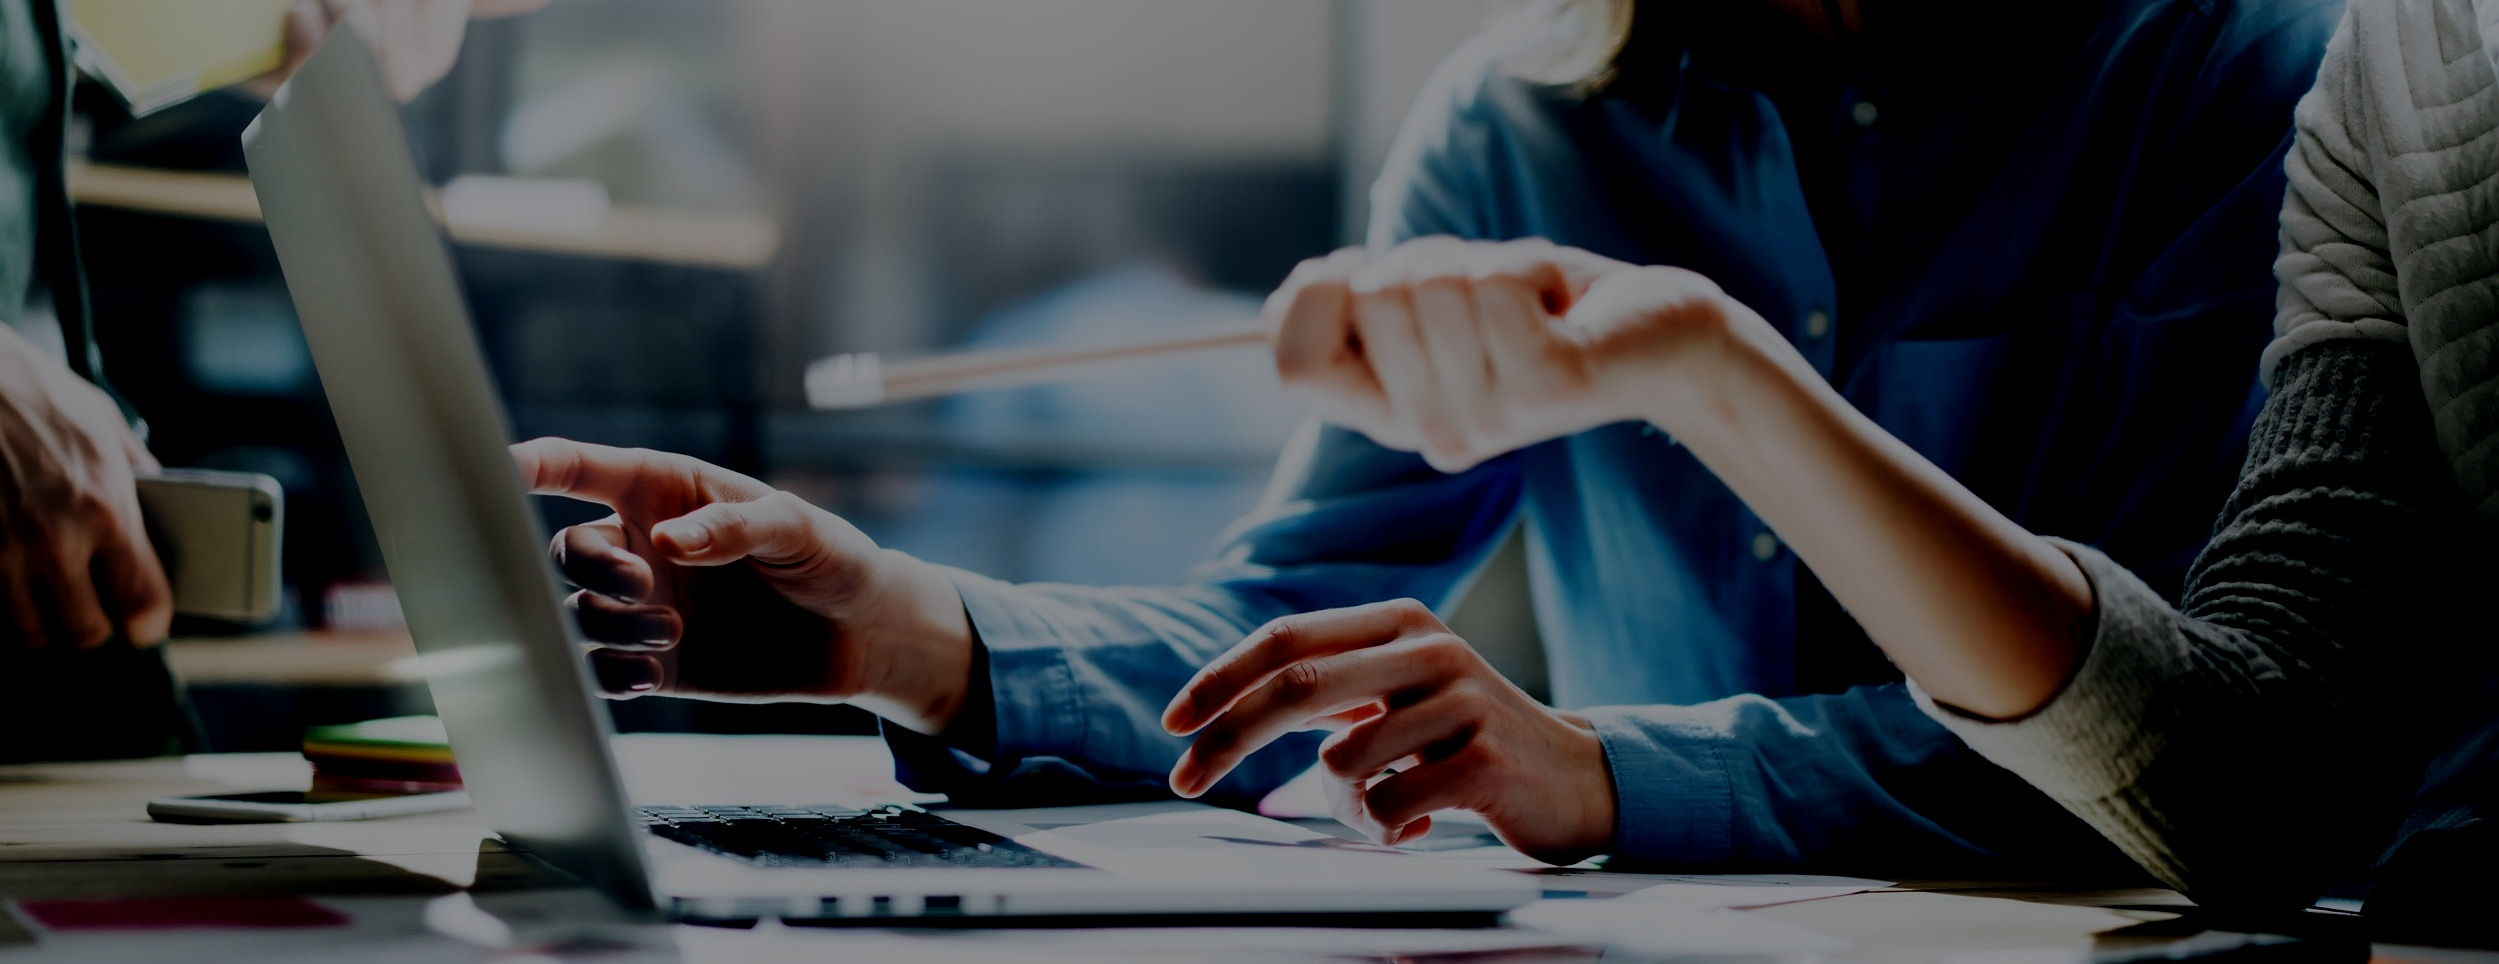 Websites & Digital Marketing Services -